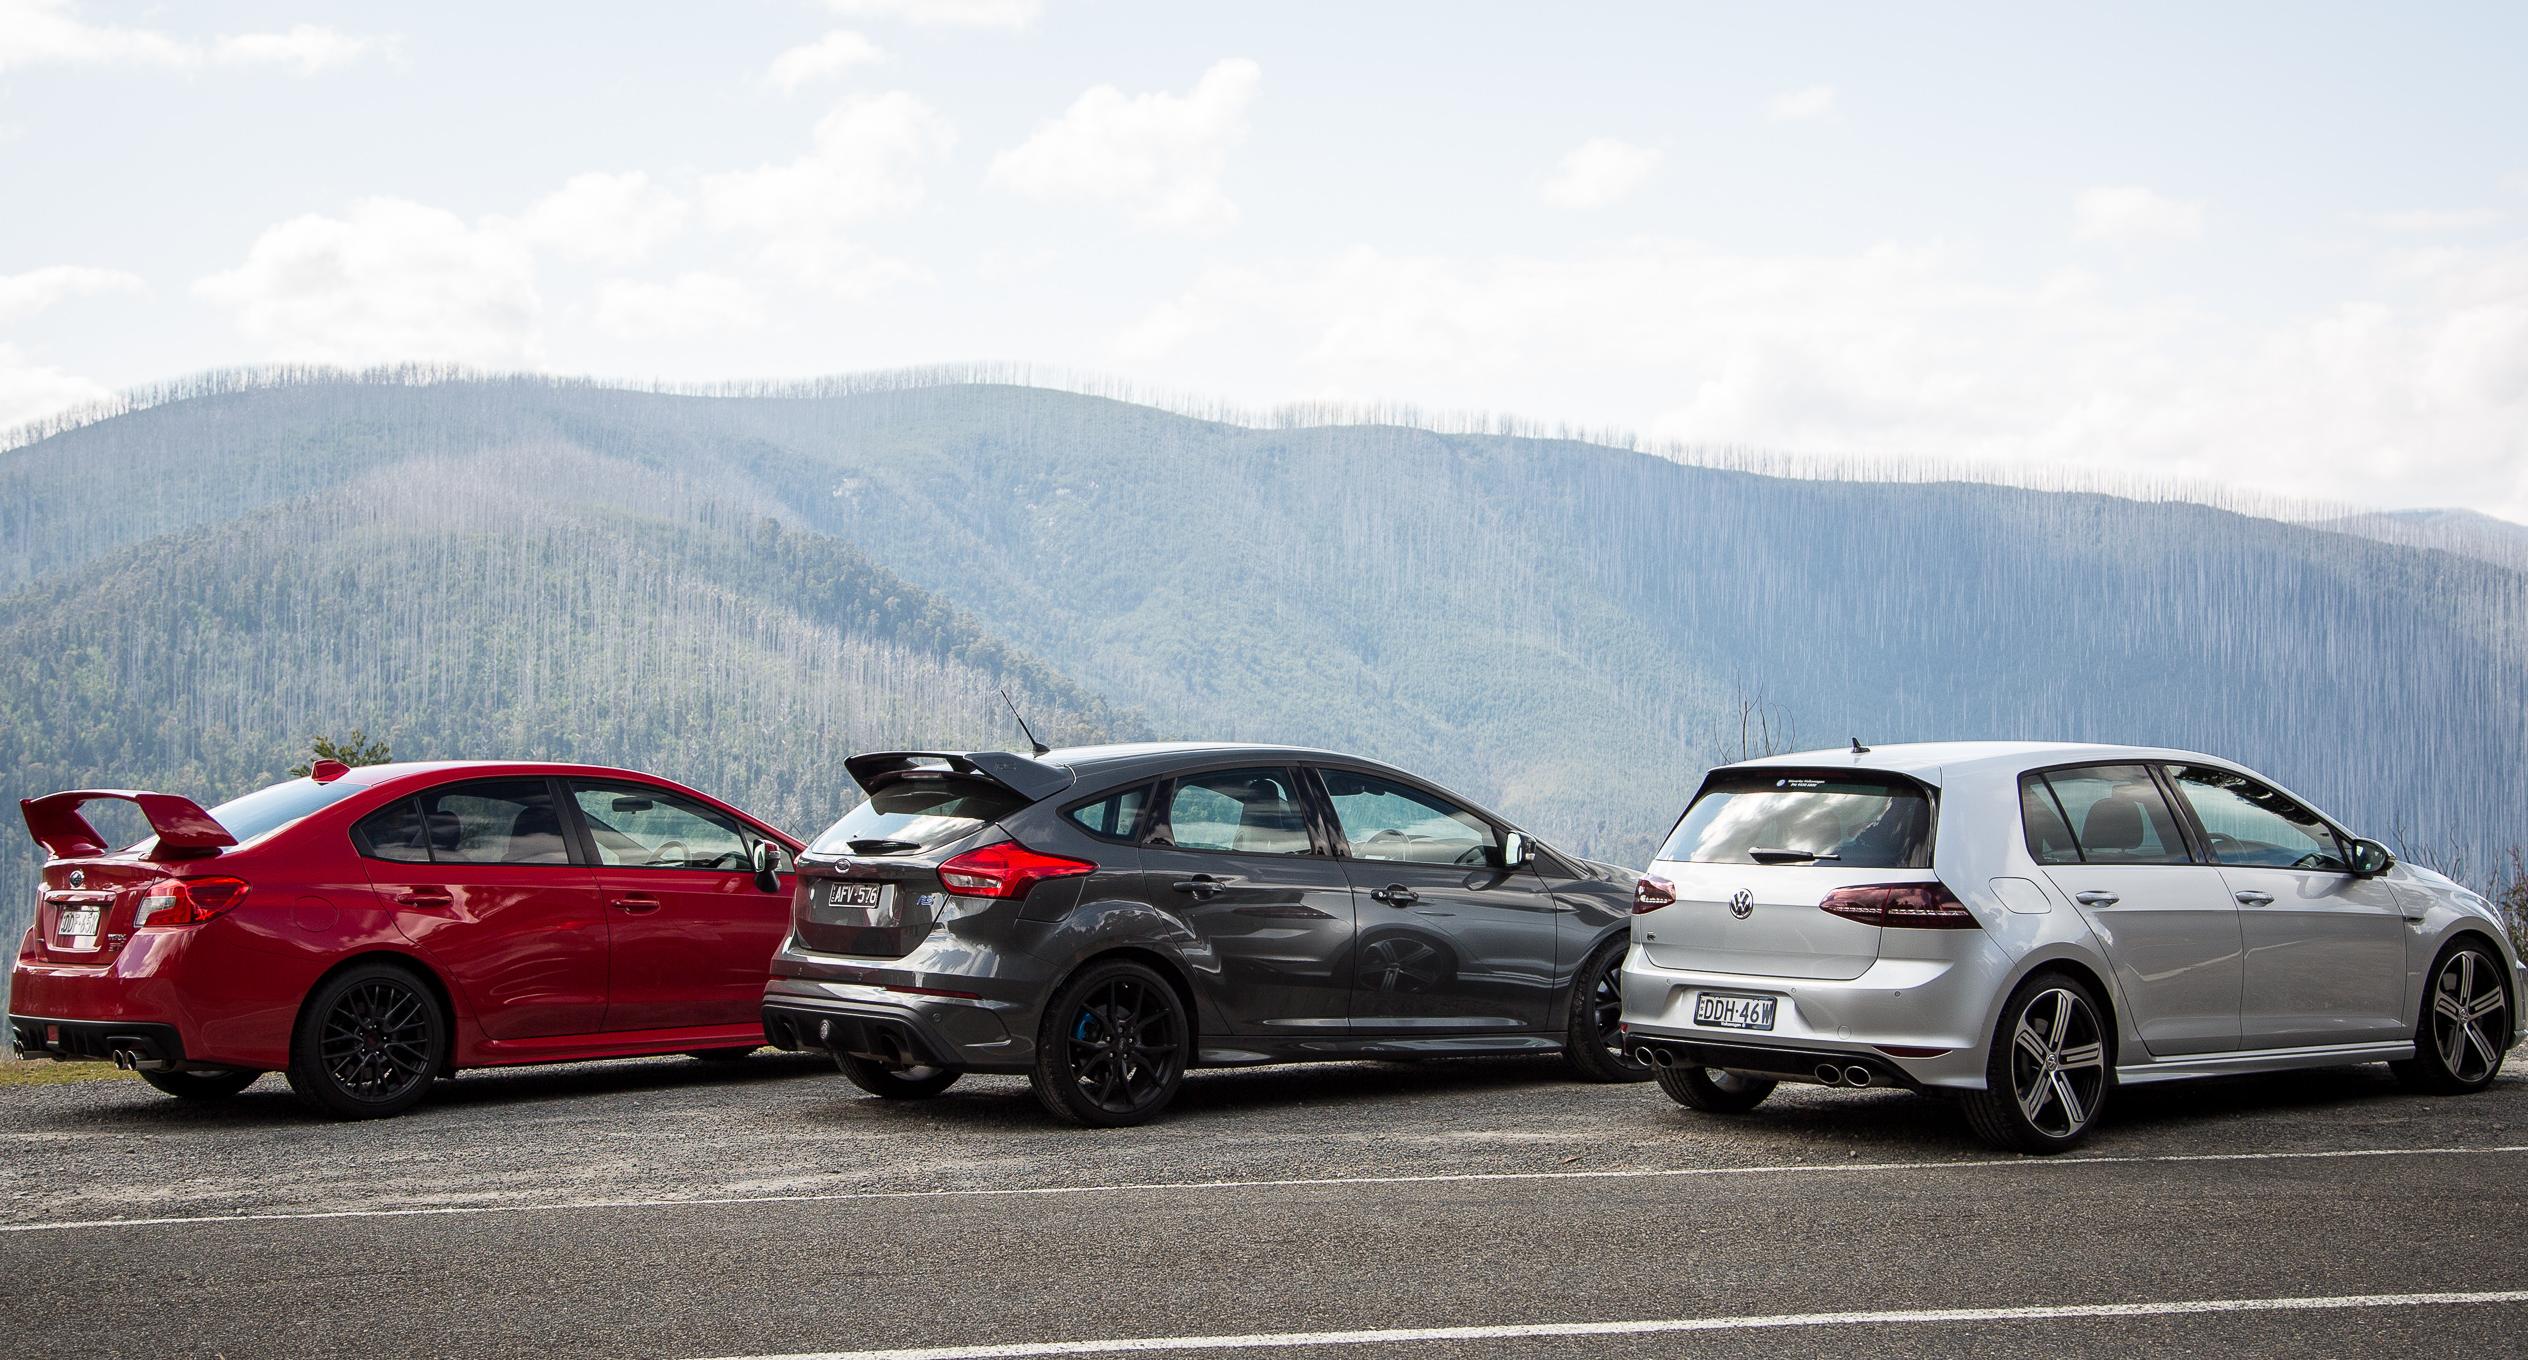 Ford Focus RS v Subaru WRX STI v Volkswagen Golf R